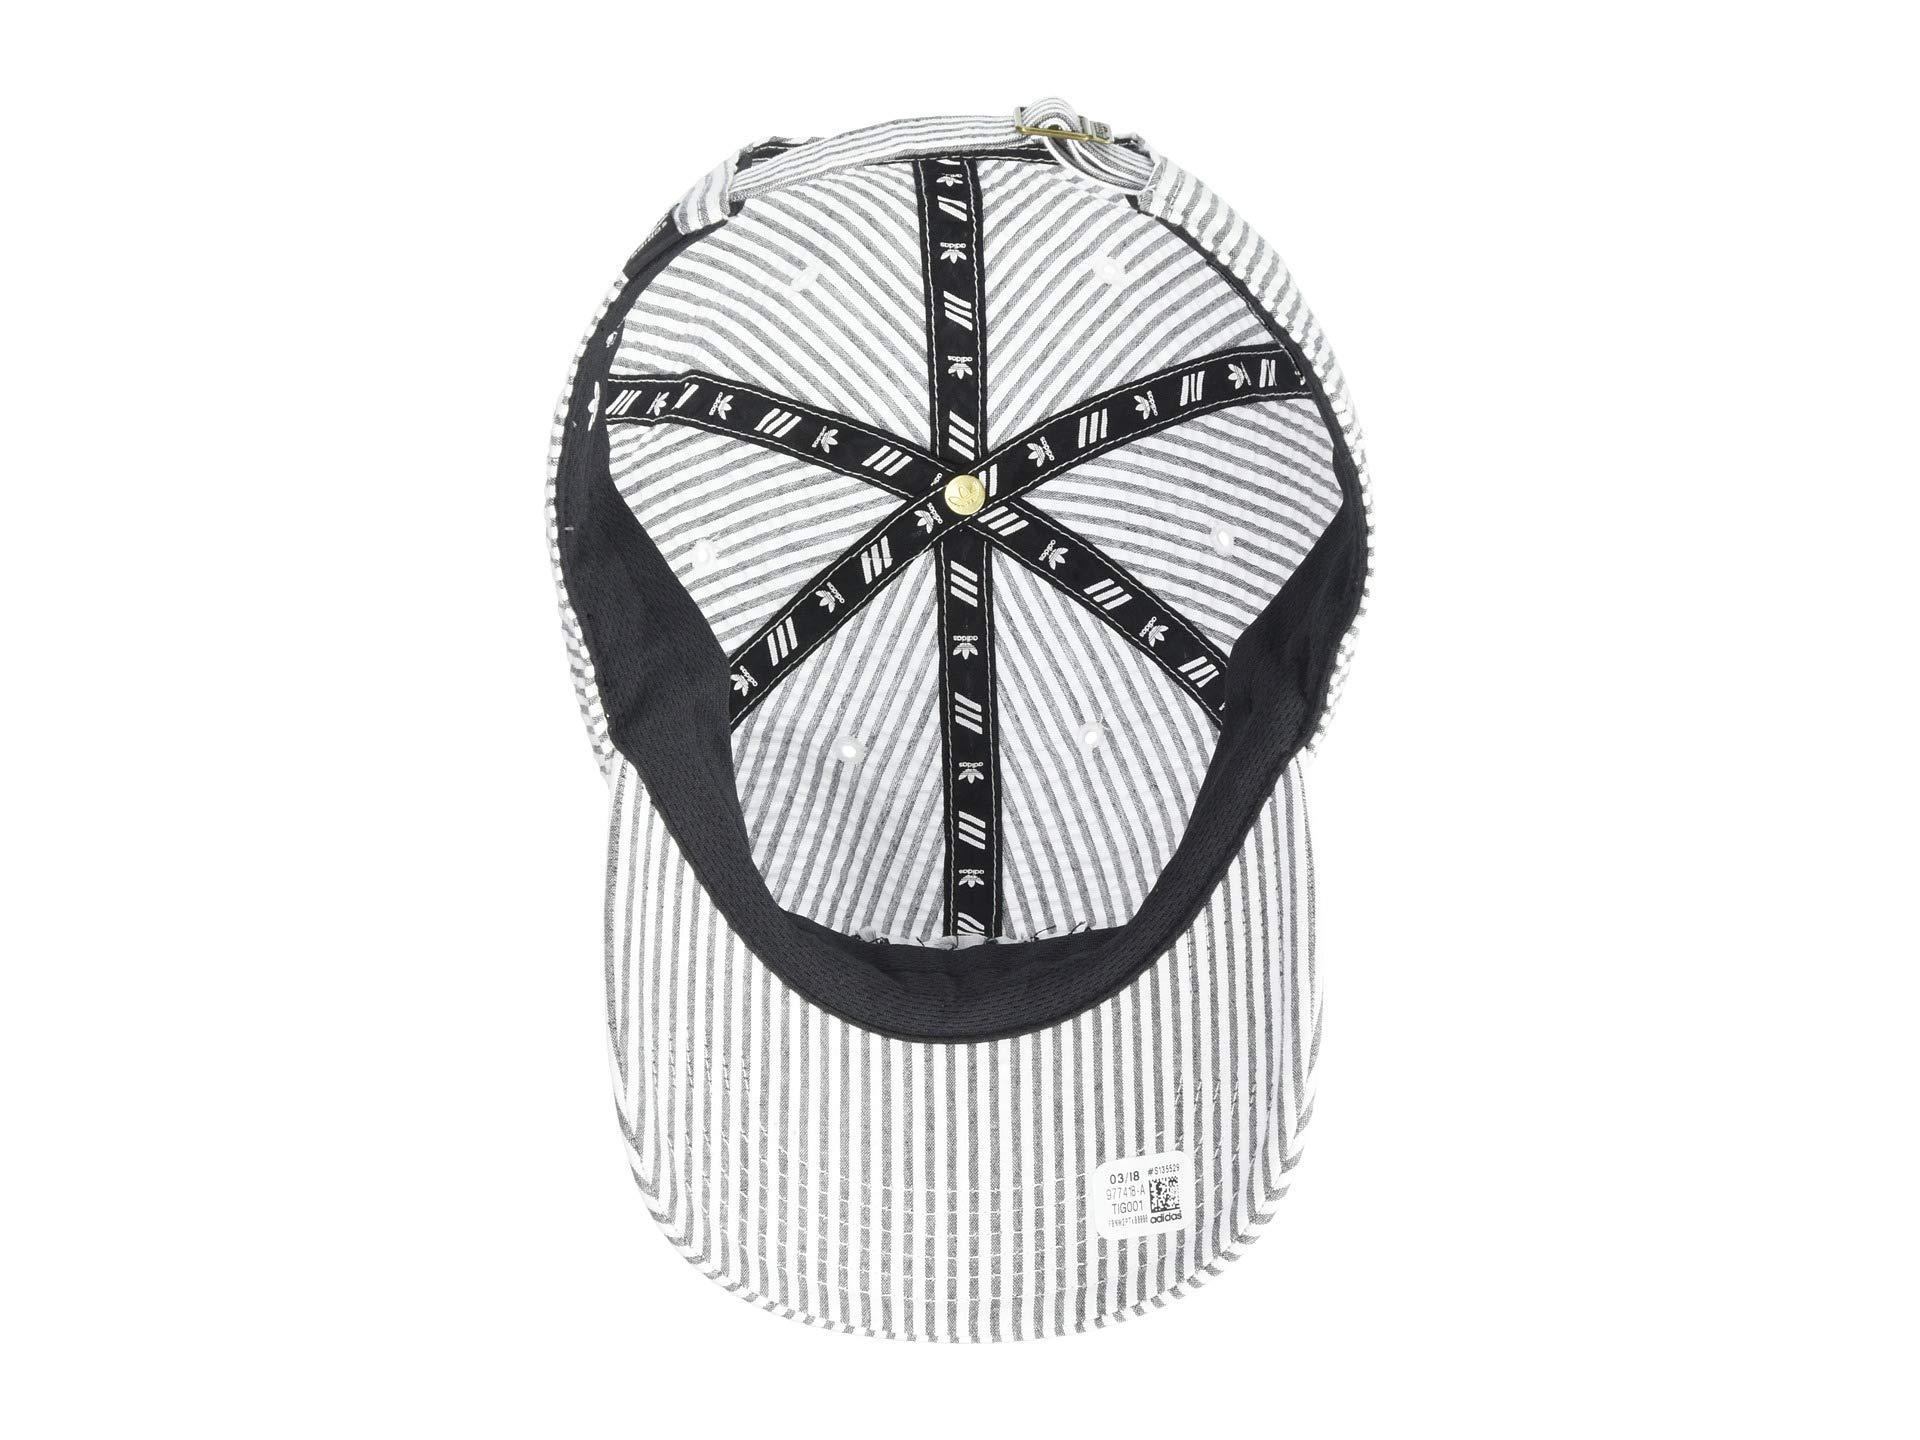 d25658446ac Adidas Originals - Originals Relaxed Seersucker Strapback (white black) Caps  for Men -. View fullscreen